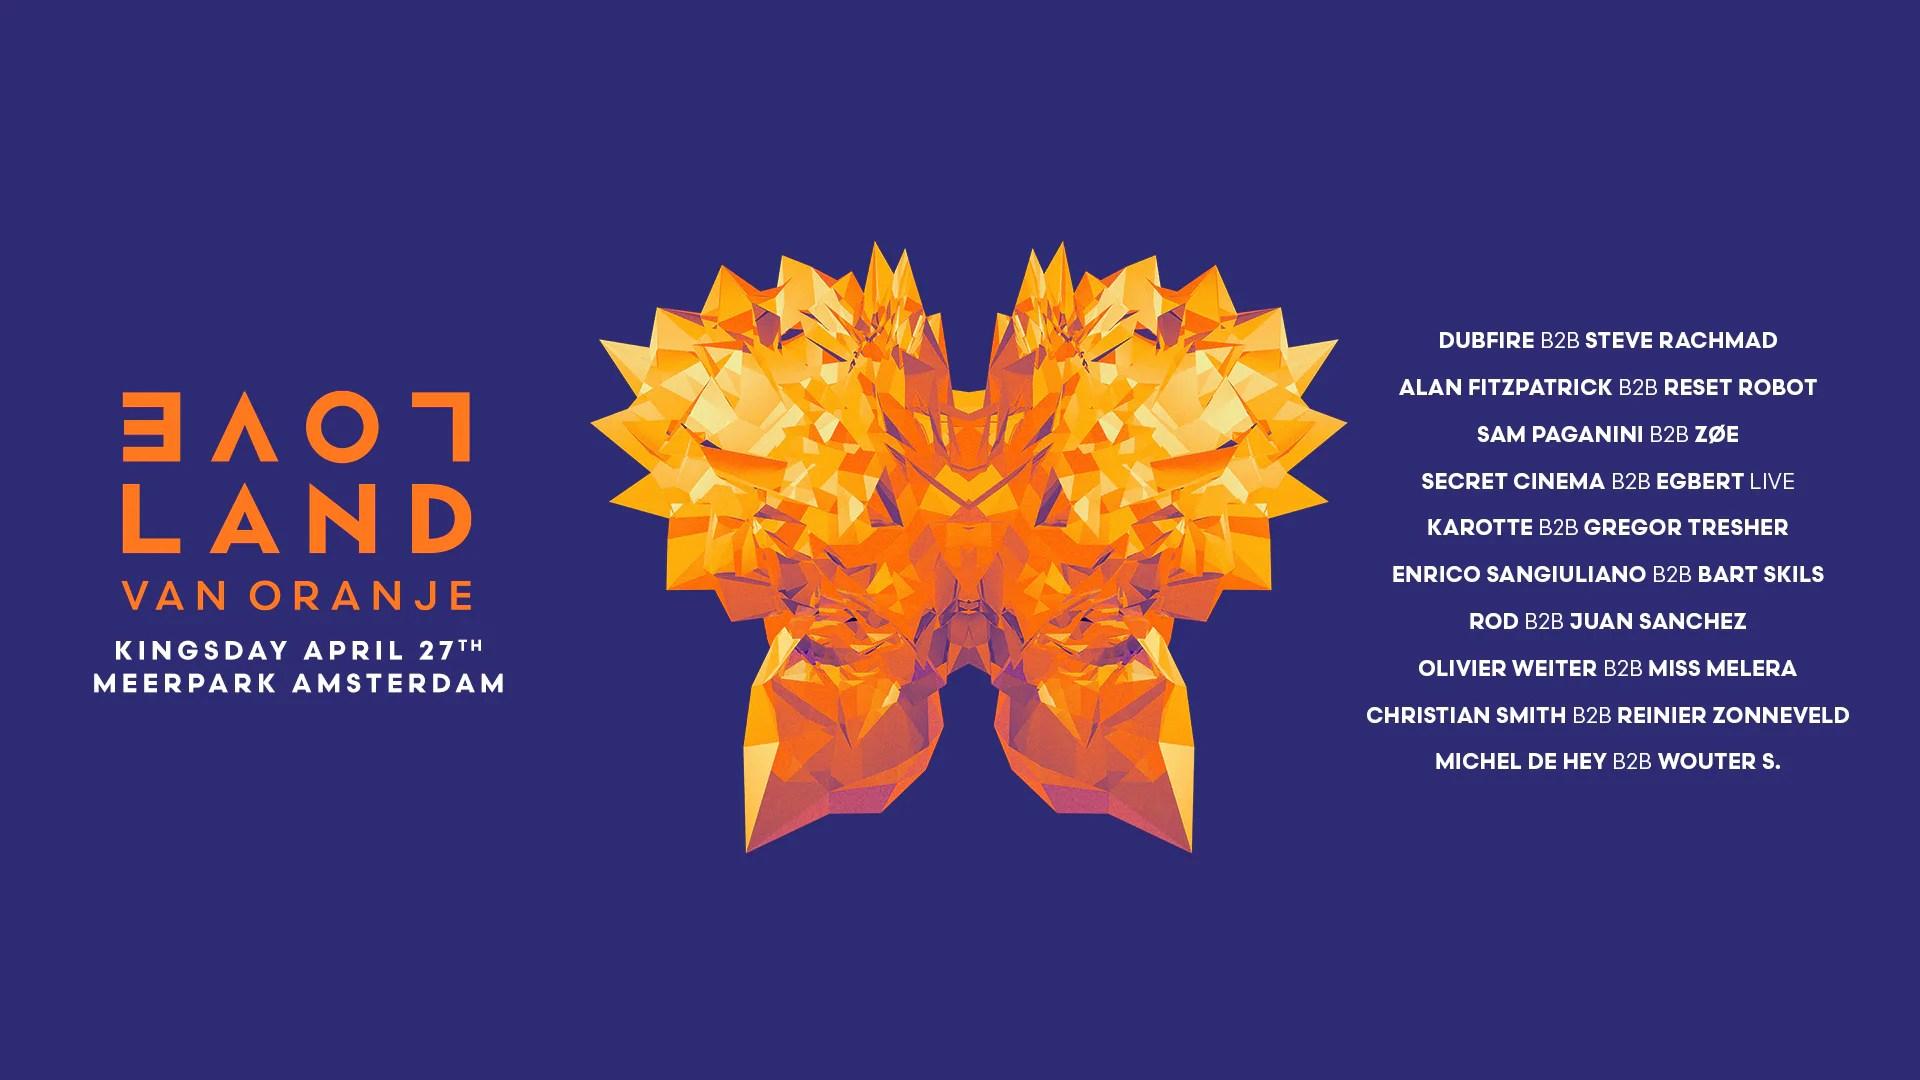 Loveland Van Oranje 2017 Amsterdam 27 Aprile Ticket E Pacchetti